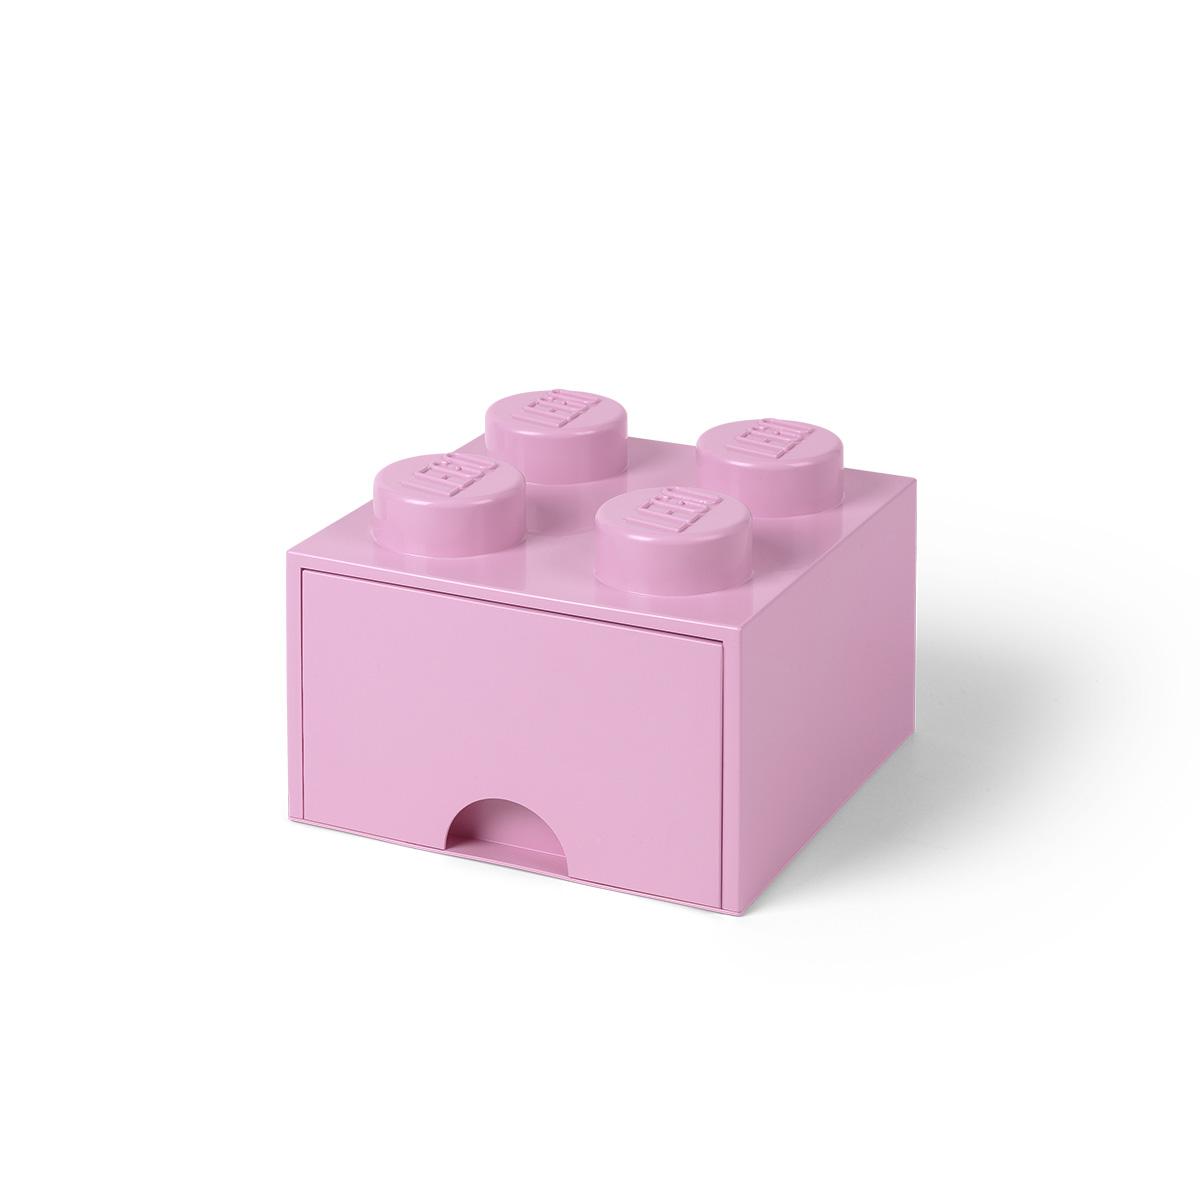 LEGO opbevaringskasse med 1 skuffe - Lyserød